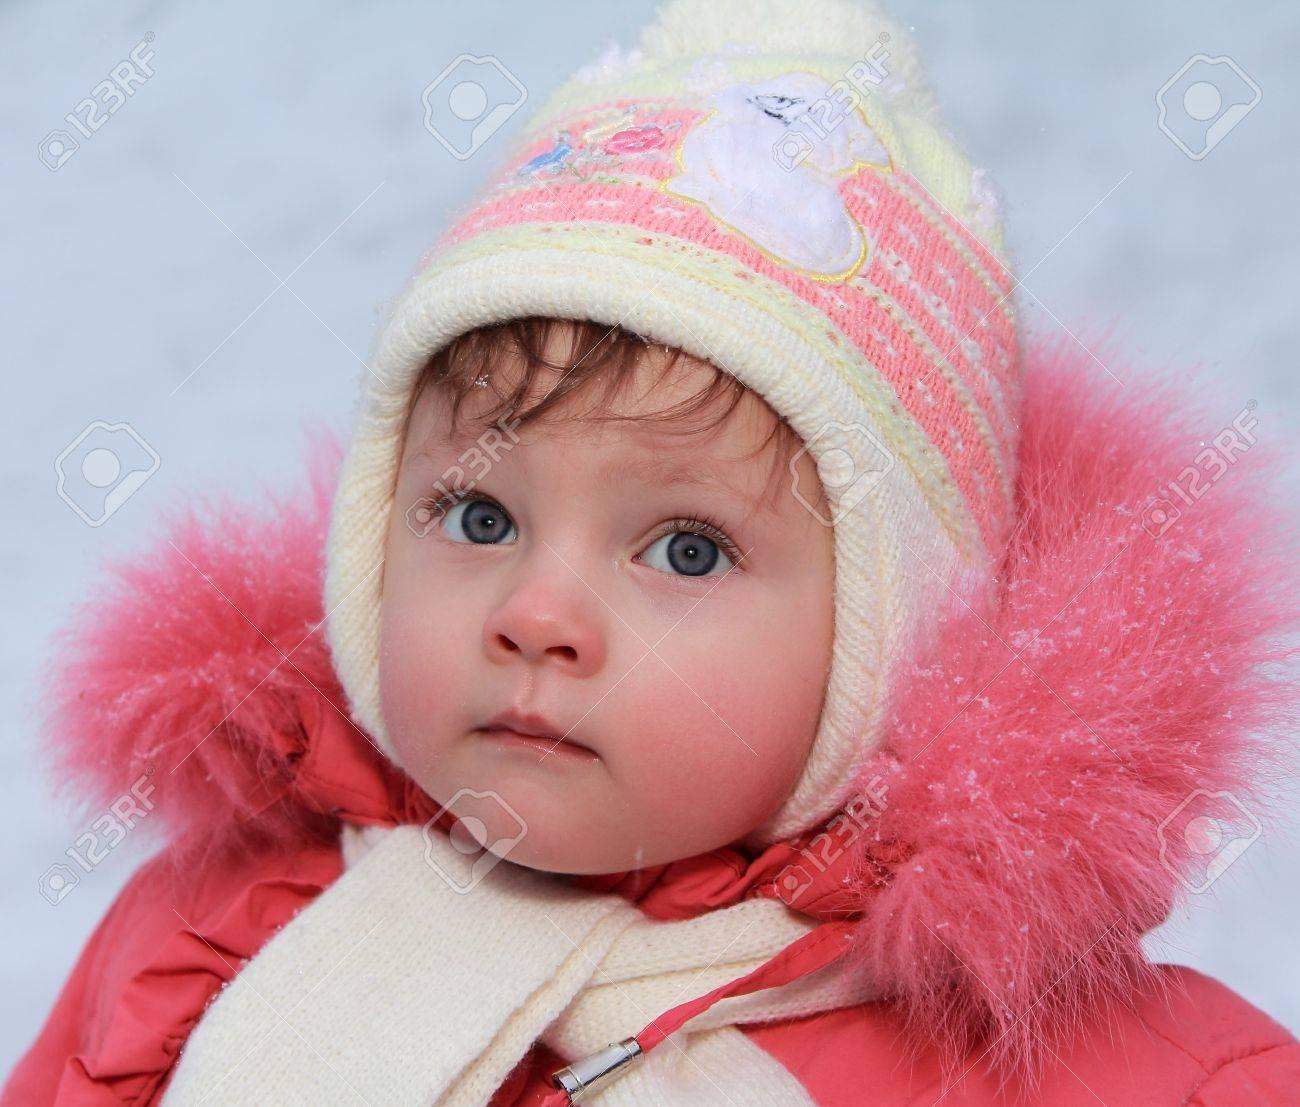 5ba912f43 Winter Baby Girl In Hat Looking Blue Fun Eyes In Red Coat Closeup ...